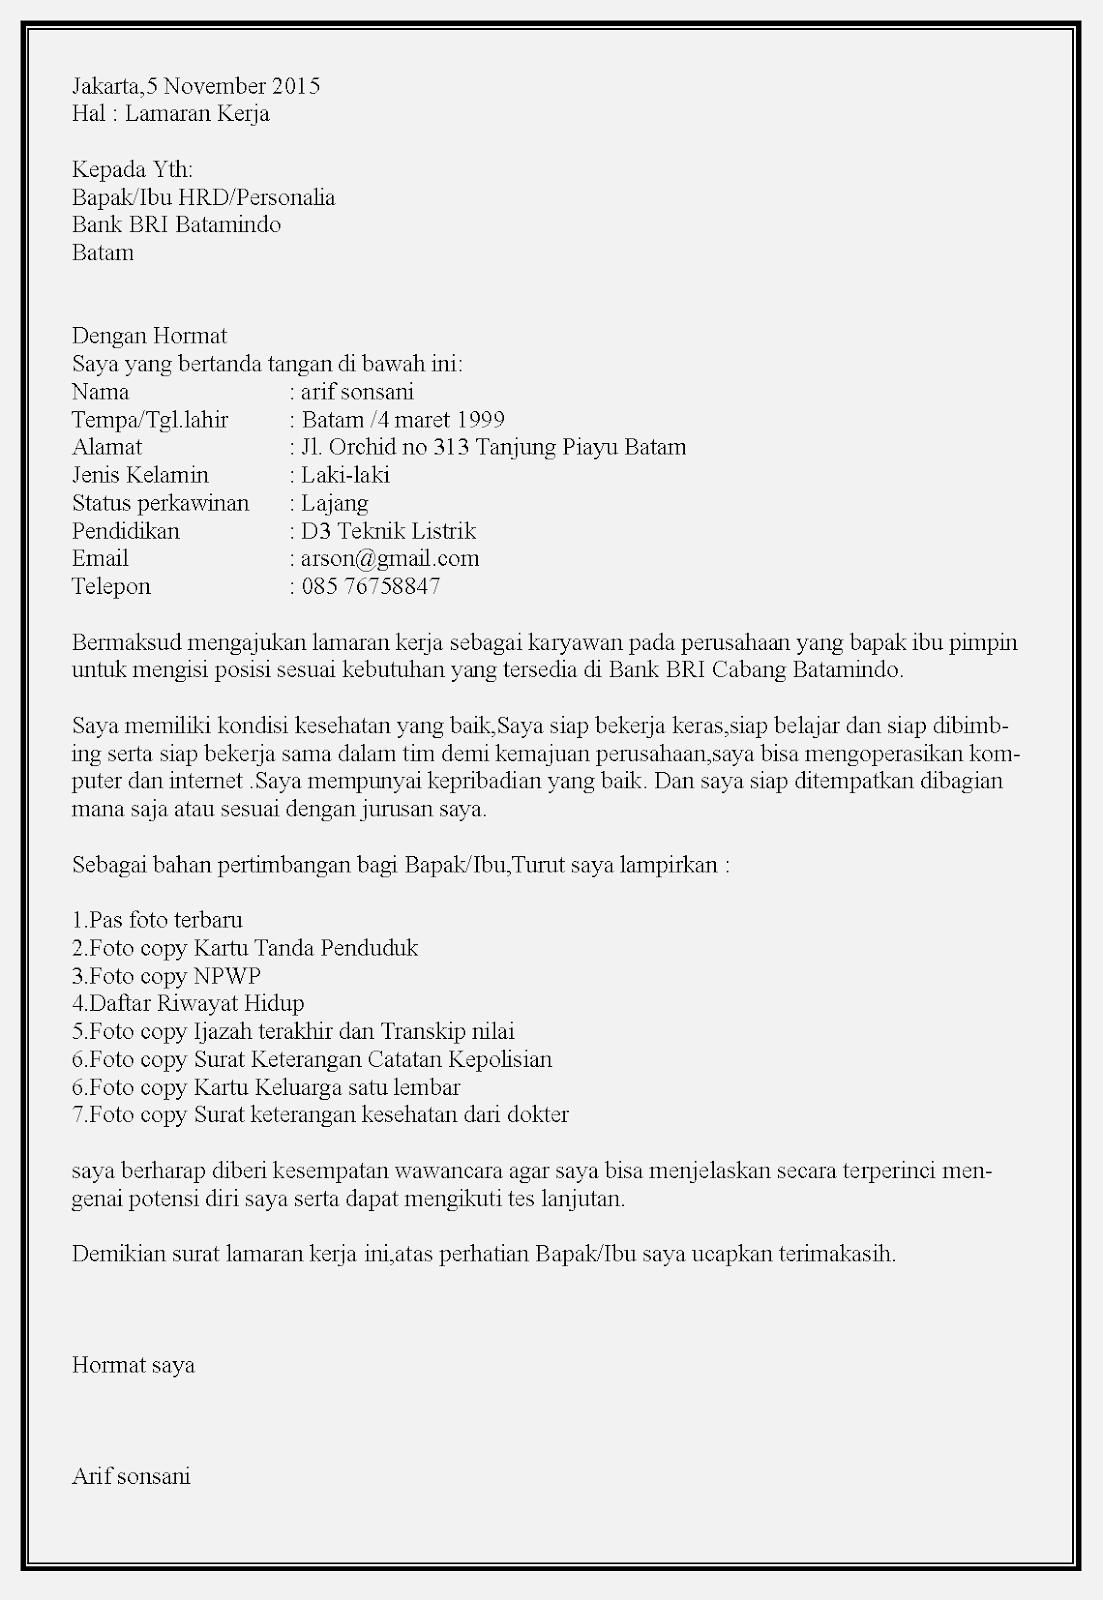 Contoh surat lamaran kerja bank BRI tanpa posisi